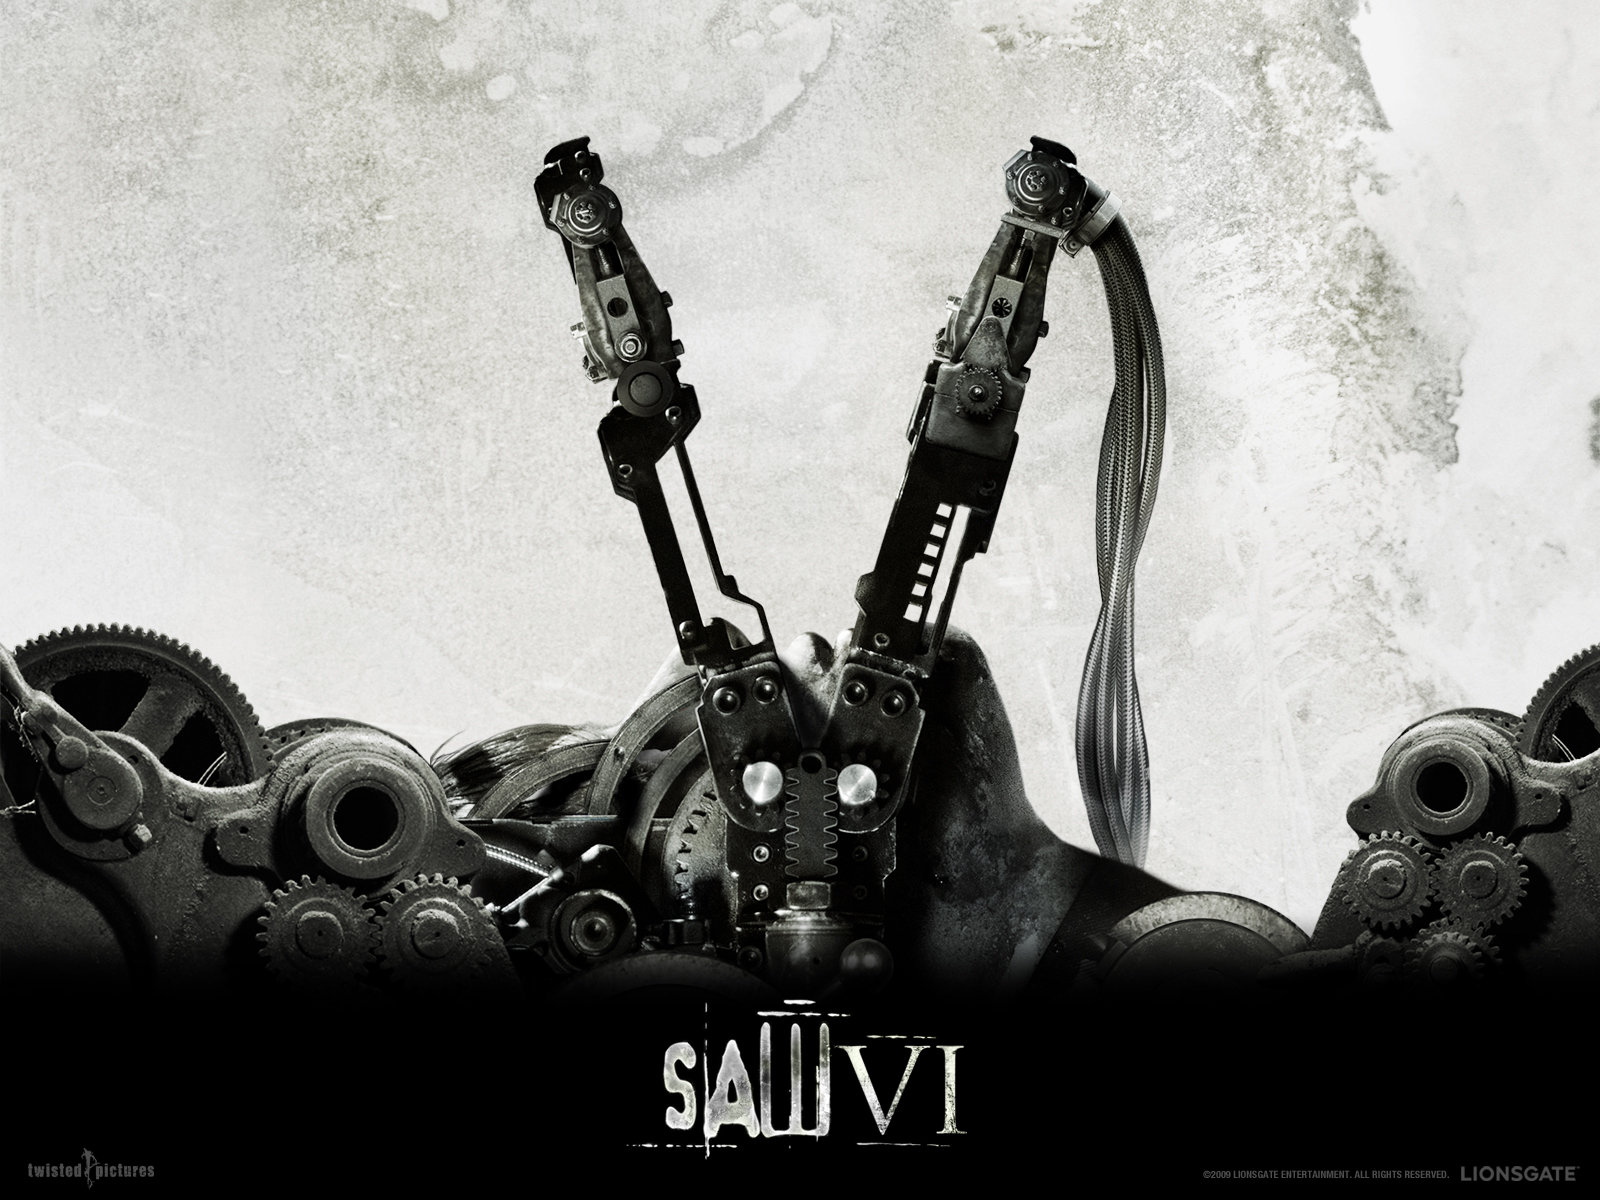 http://4.bp.blogspot.com/_EAViqbzwc_s/TO9HhALF1TI/AAAAAAAACgI/59SYyoQMJmc/s1600/1256710464_1600x1200_saw-vi-2012-movie-wallpaper.jpg